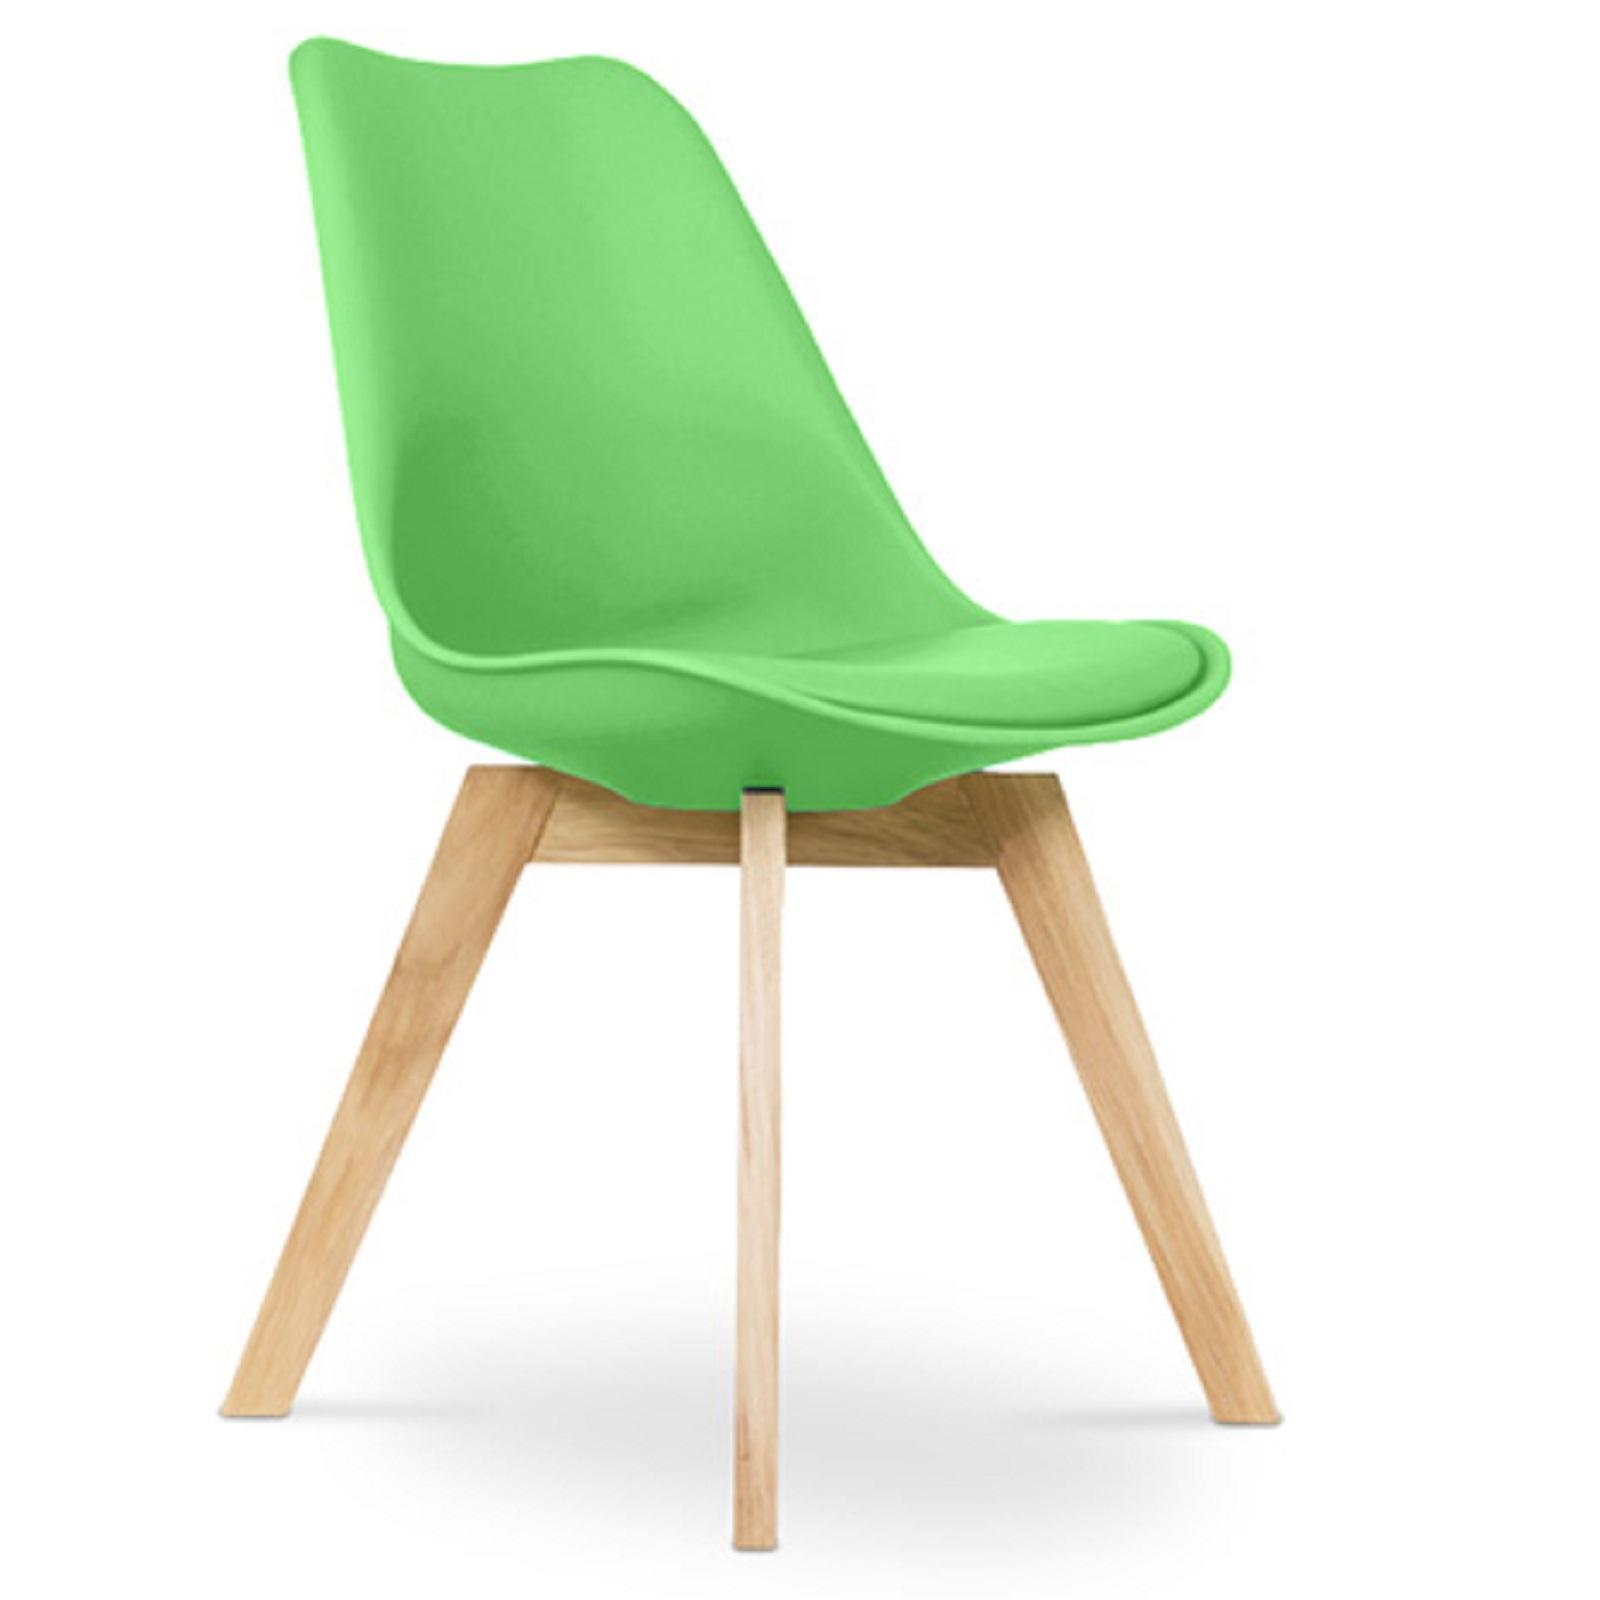 chaise scandinave avec coussin simili vert inspir charles. Black Bedroom Furniture Sets. Home Design Ideas